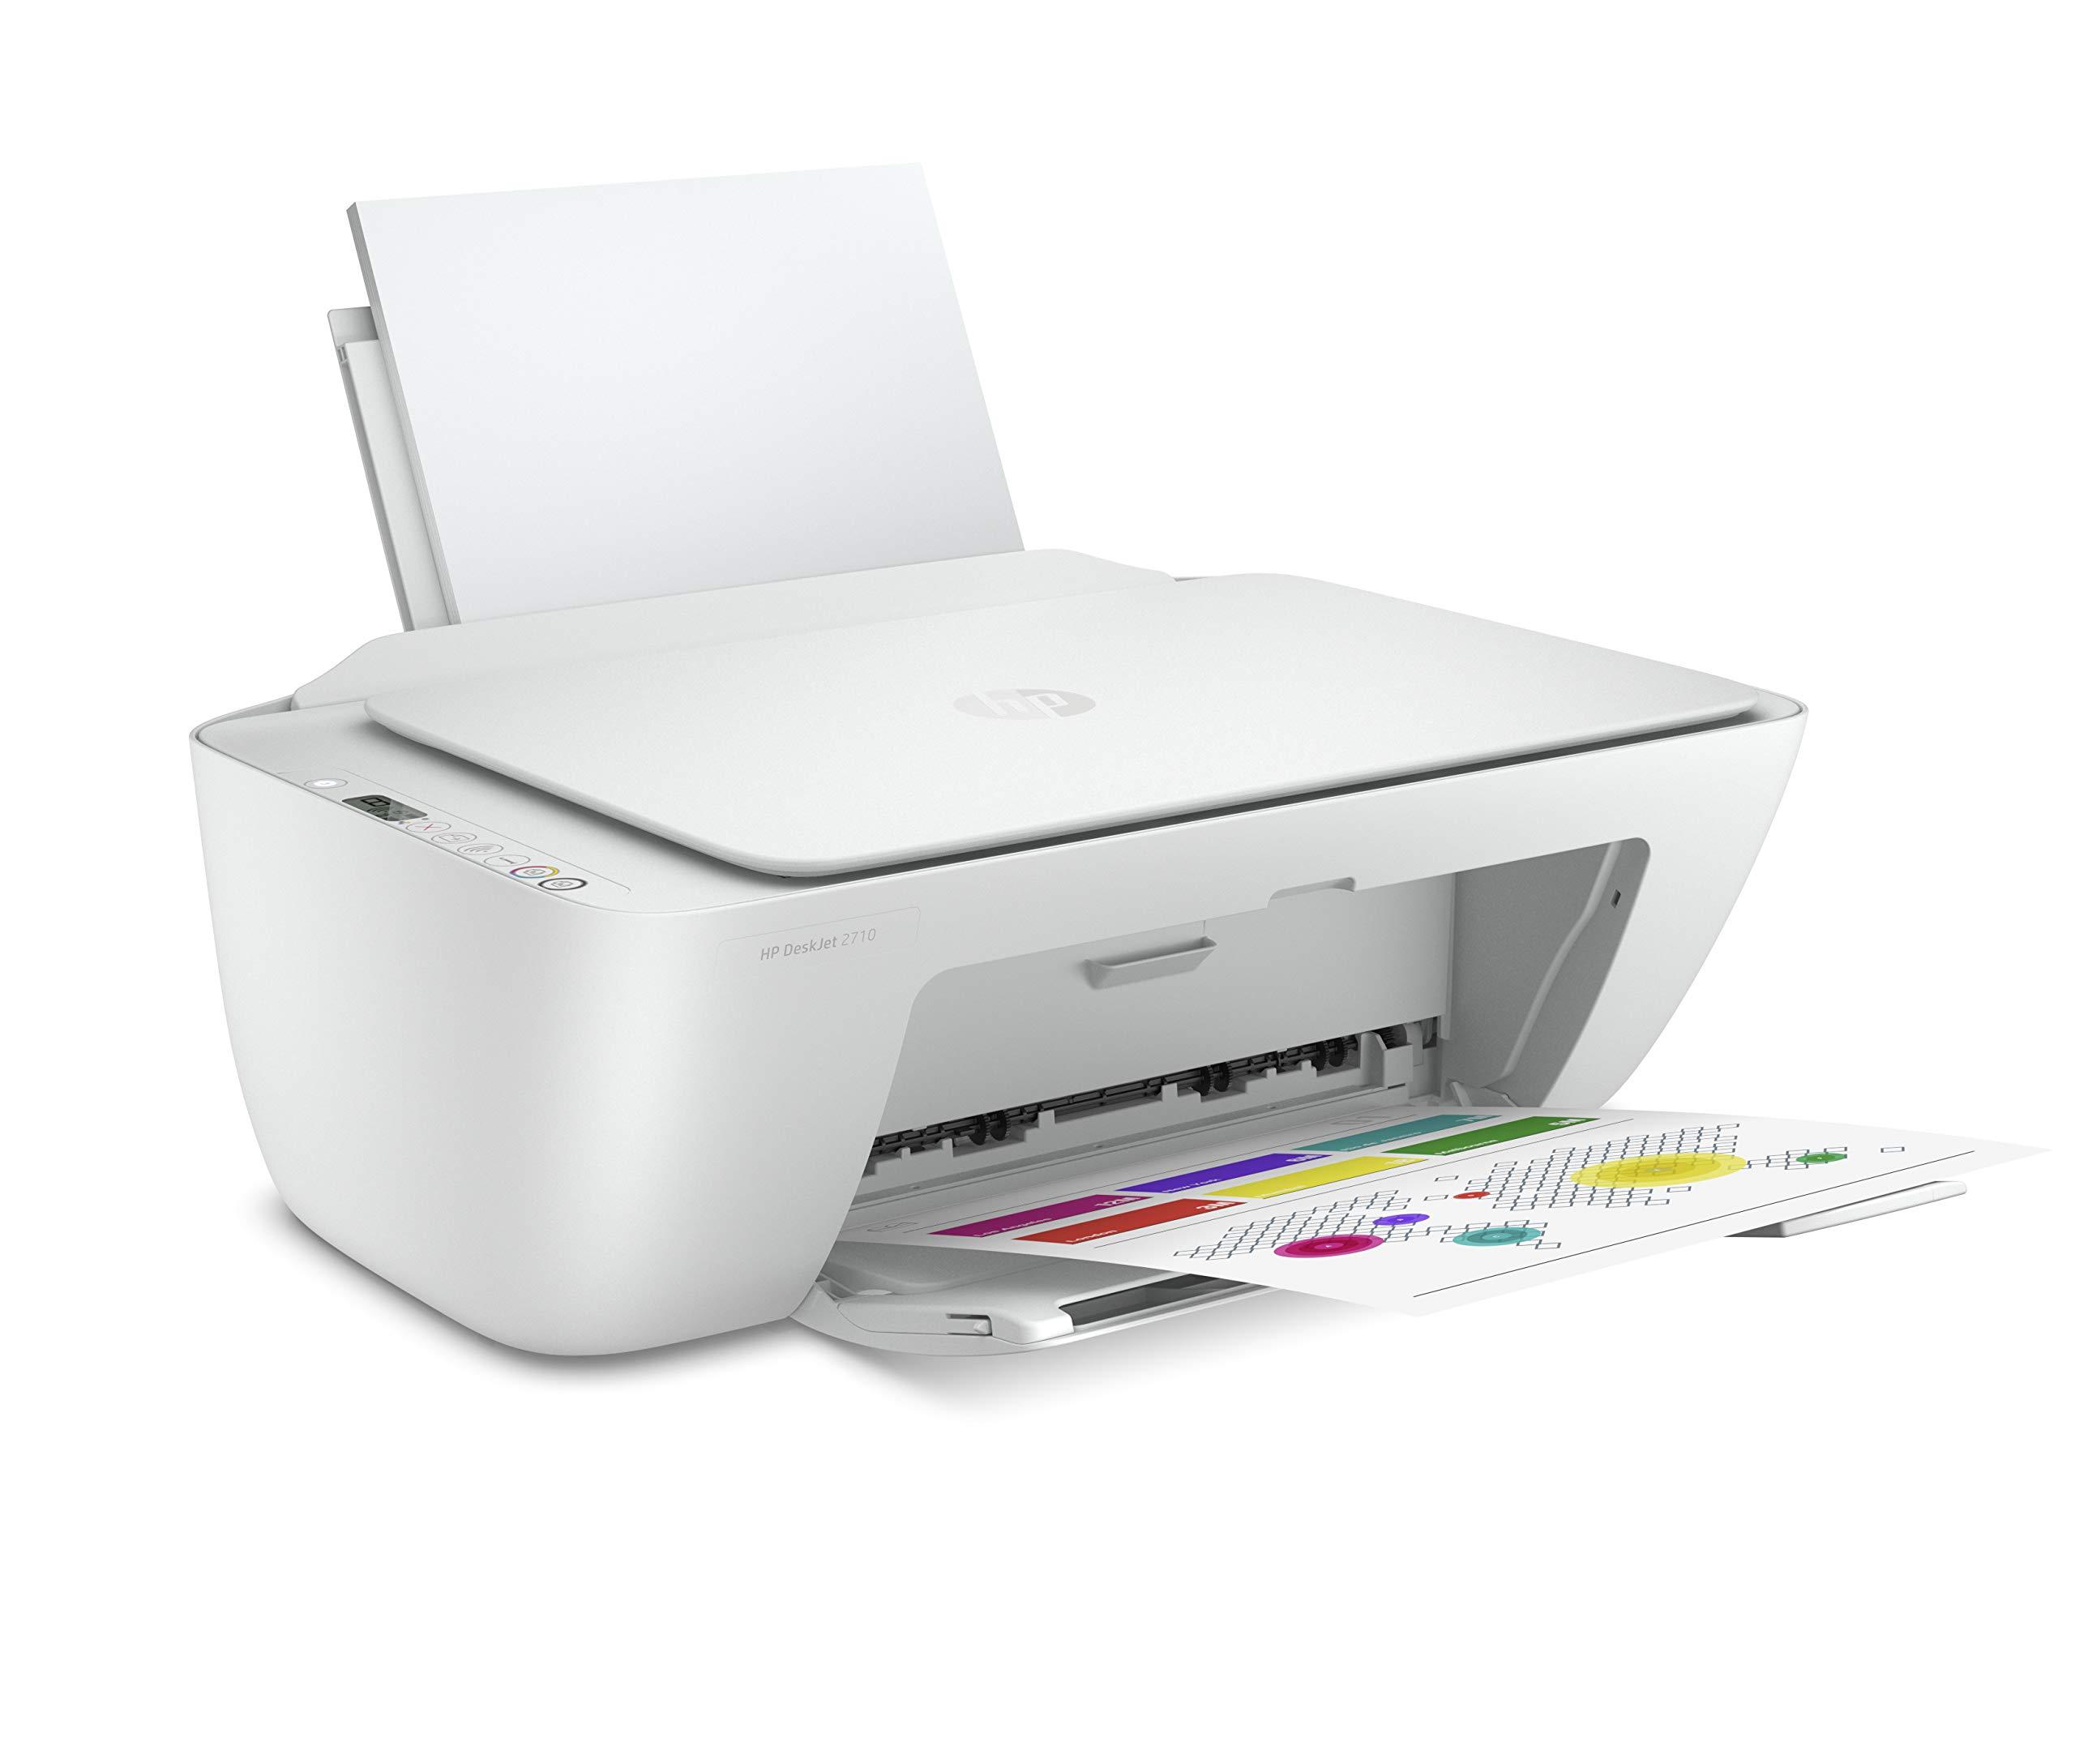 HP DeskJet 2710 Printer, All-in-One - Wireless, Print, Copy & Scan Inkjet  Printer: Buy Online at Best Price in UAE - Amazon.ae